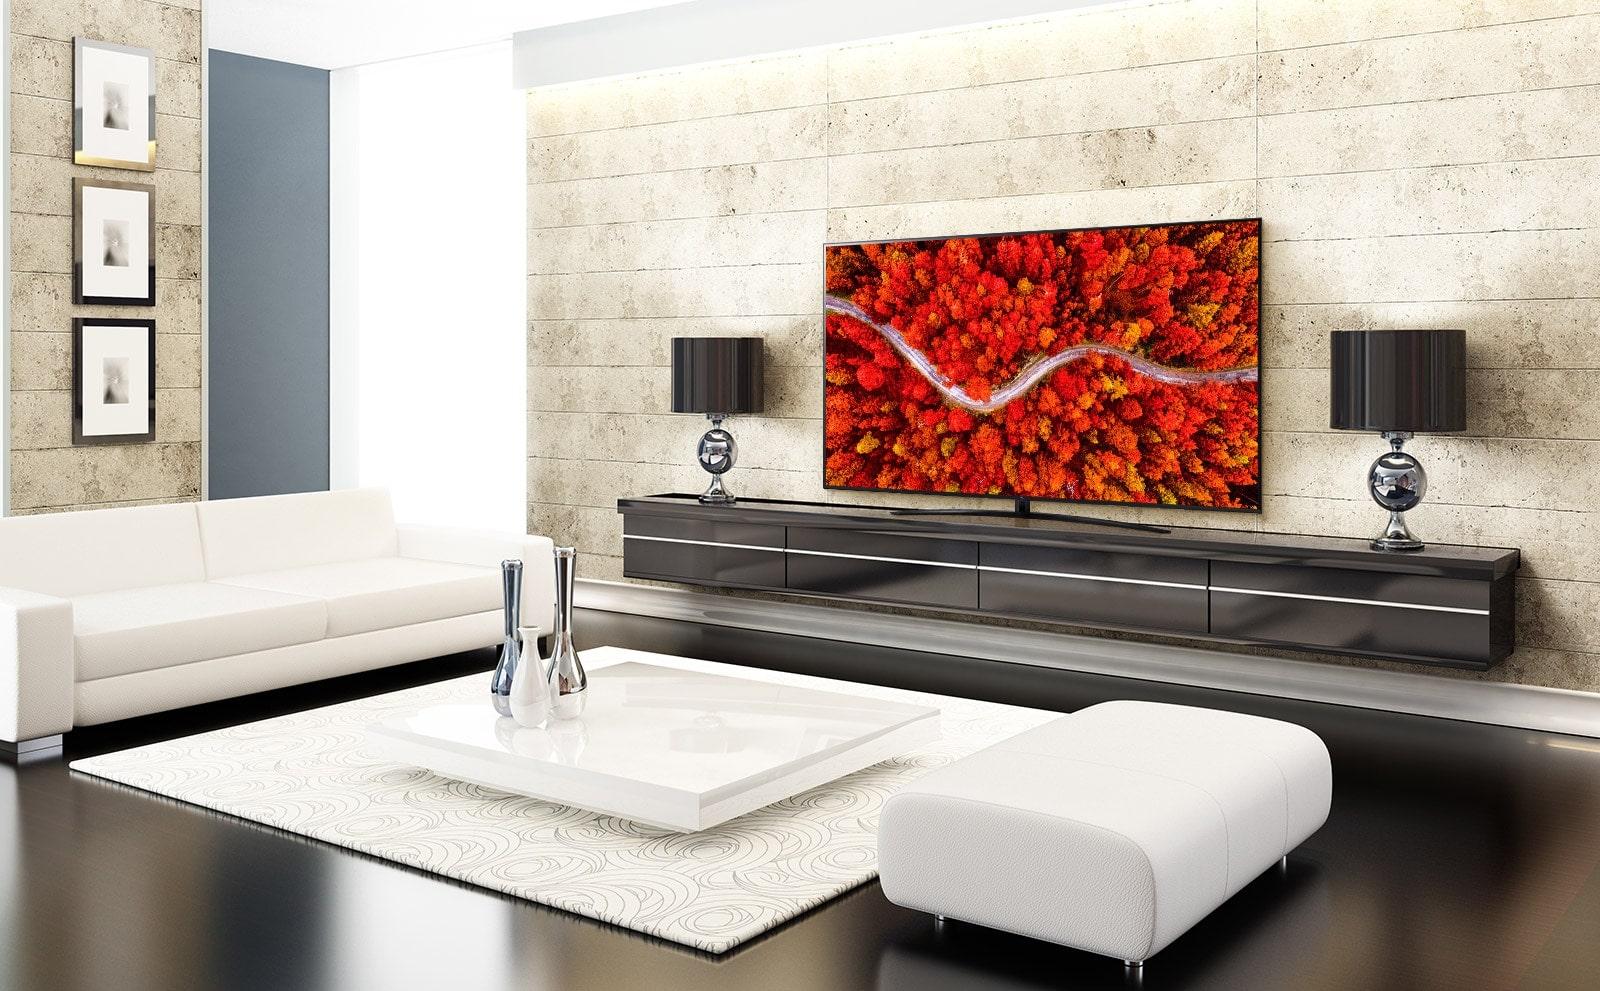 Luksuzna dnevna soba s televizorom na kojem se prikazuje zračni pogled na šumu u crvenoj boji.